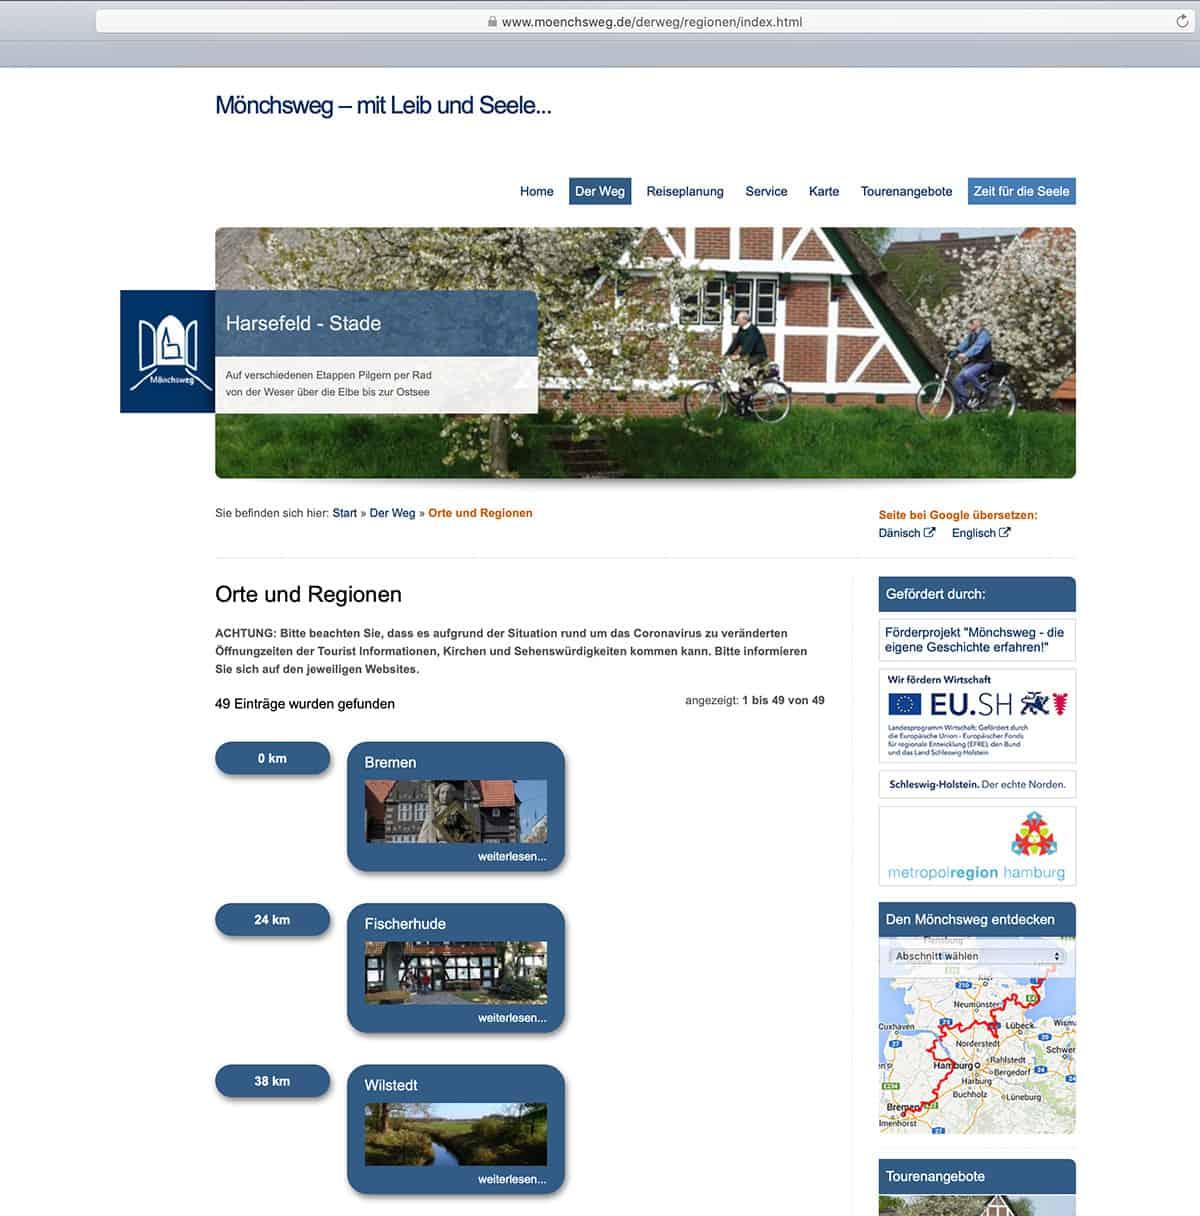 Website des Mönchsweg